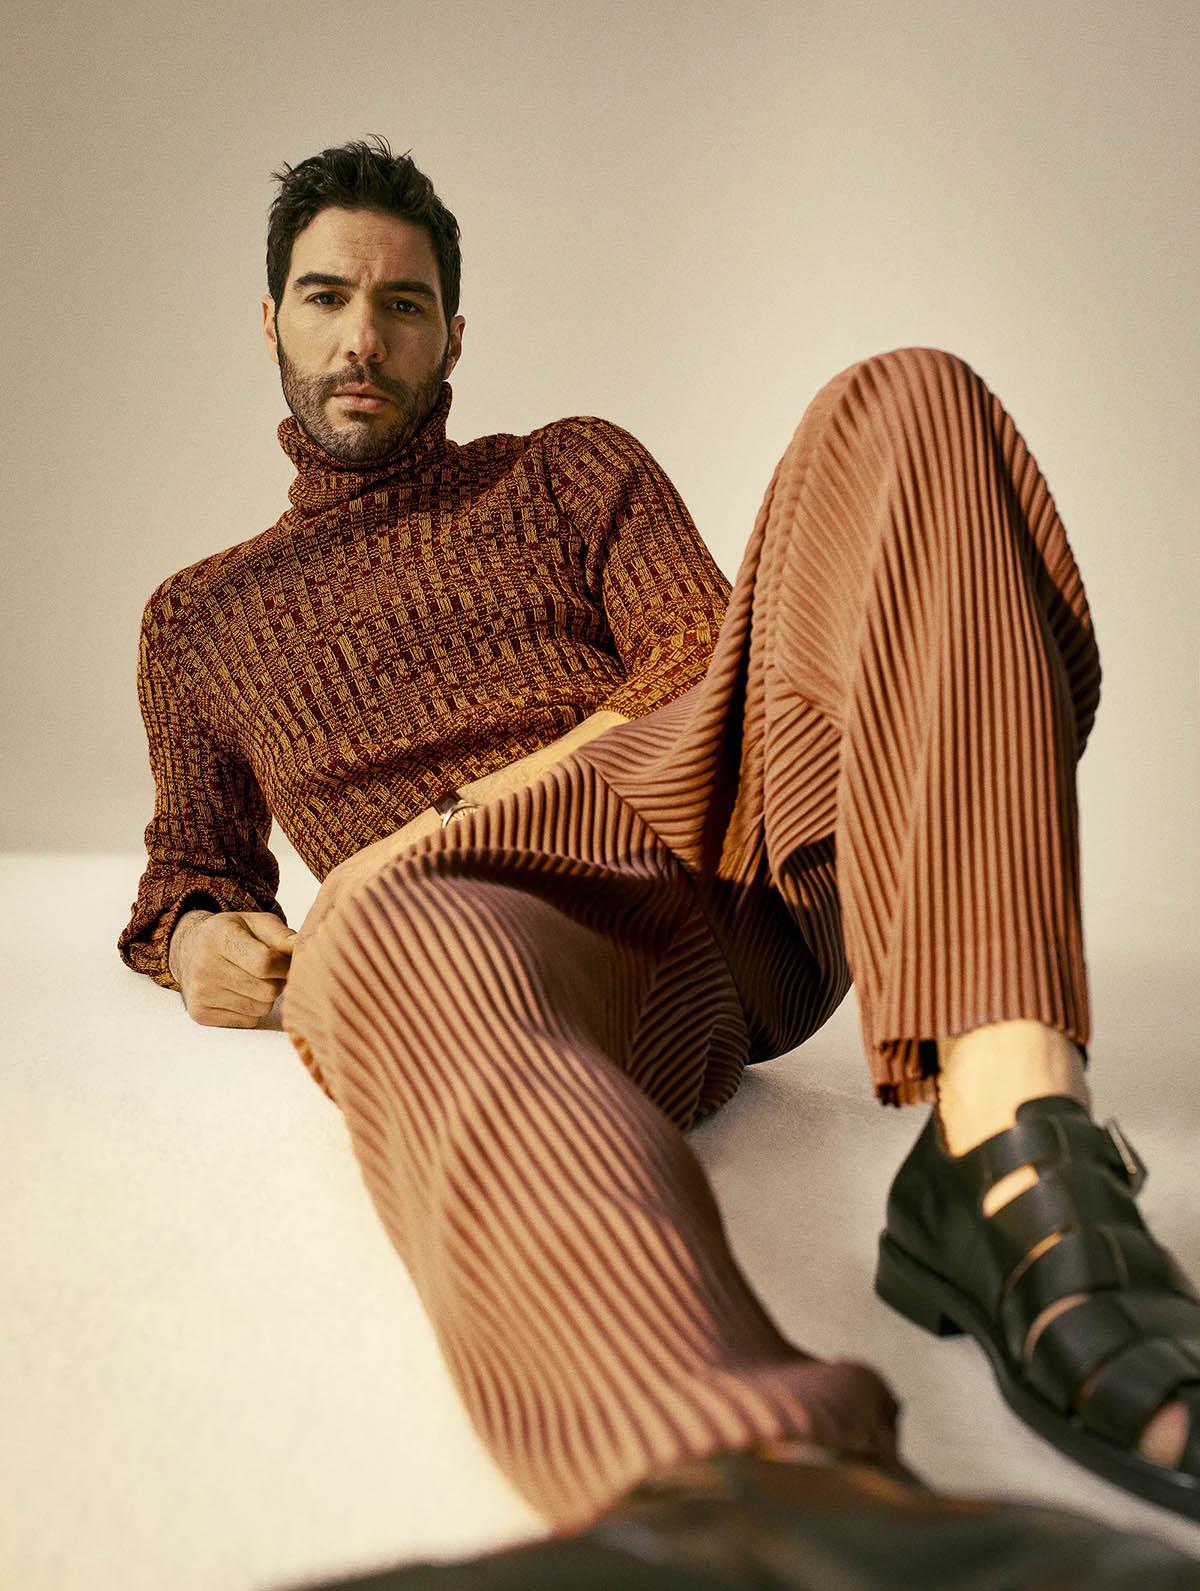 Tahar Rahim by Raul Ruz for L'Officiel Hommes Italia Issue 26